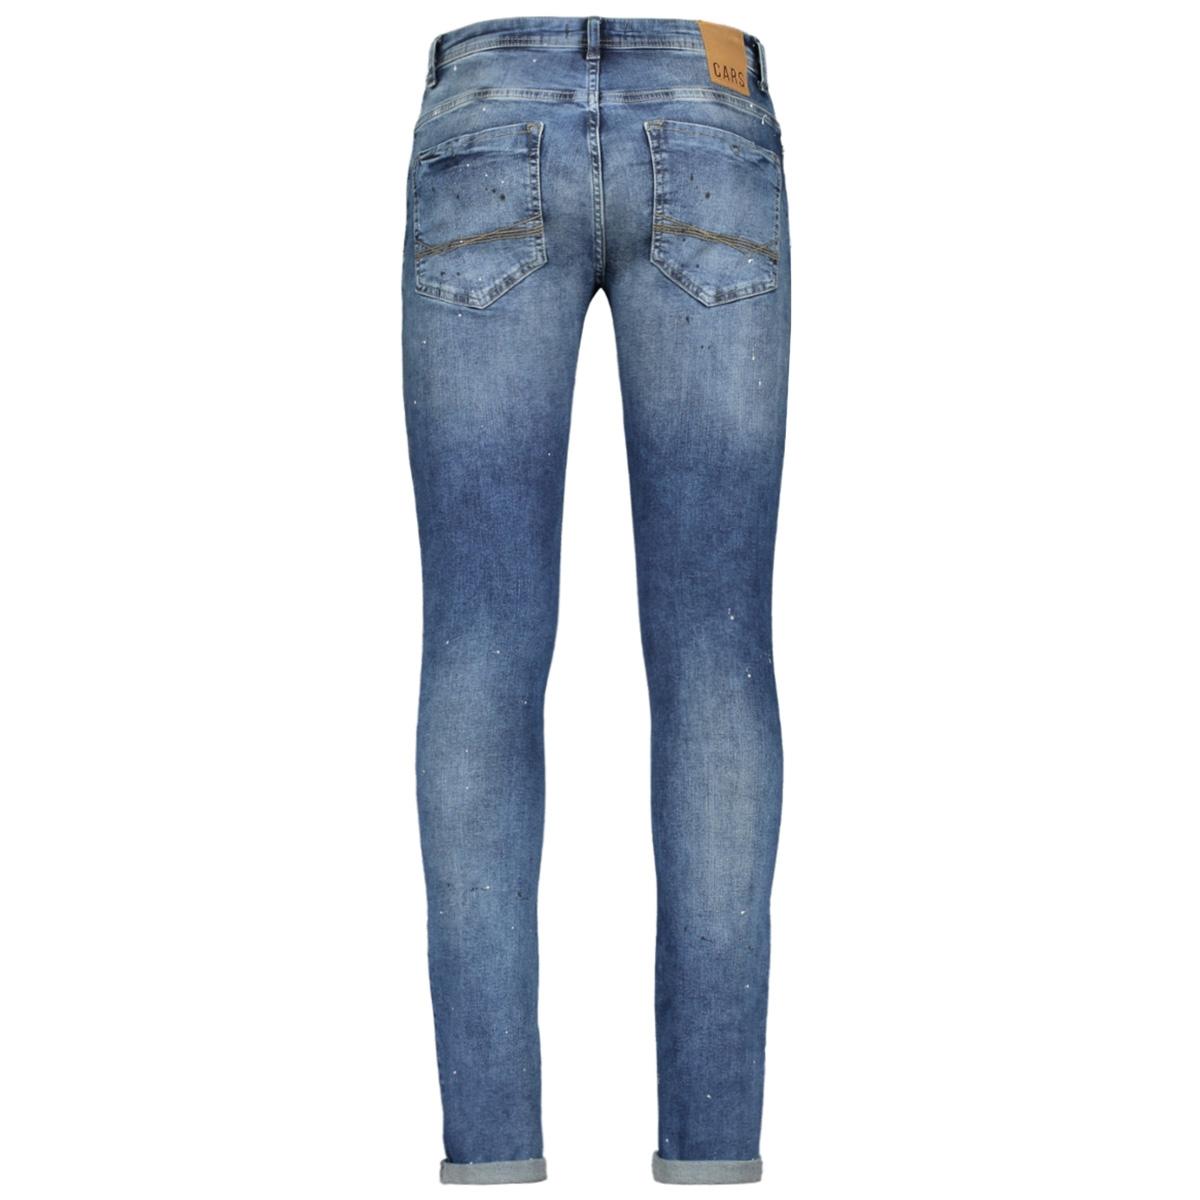 dust super skinny 75528 cars jeans 28 spot dark used